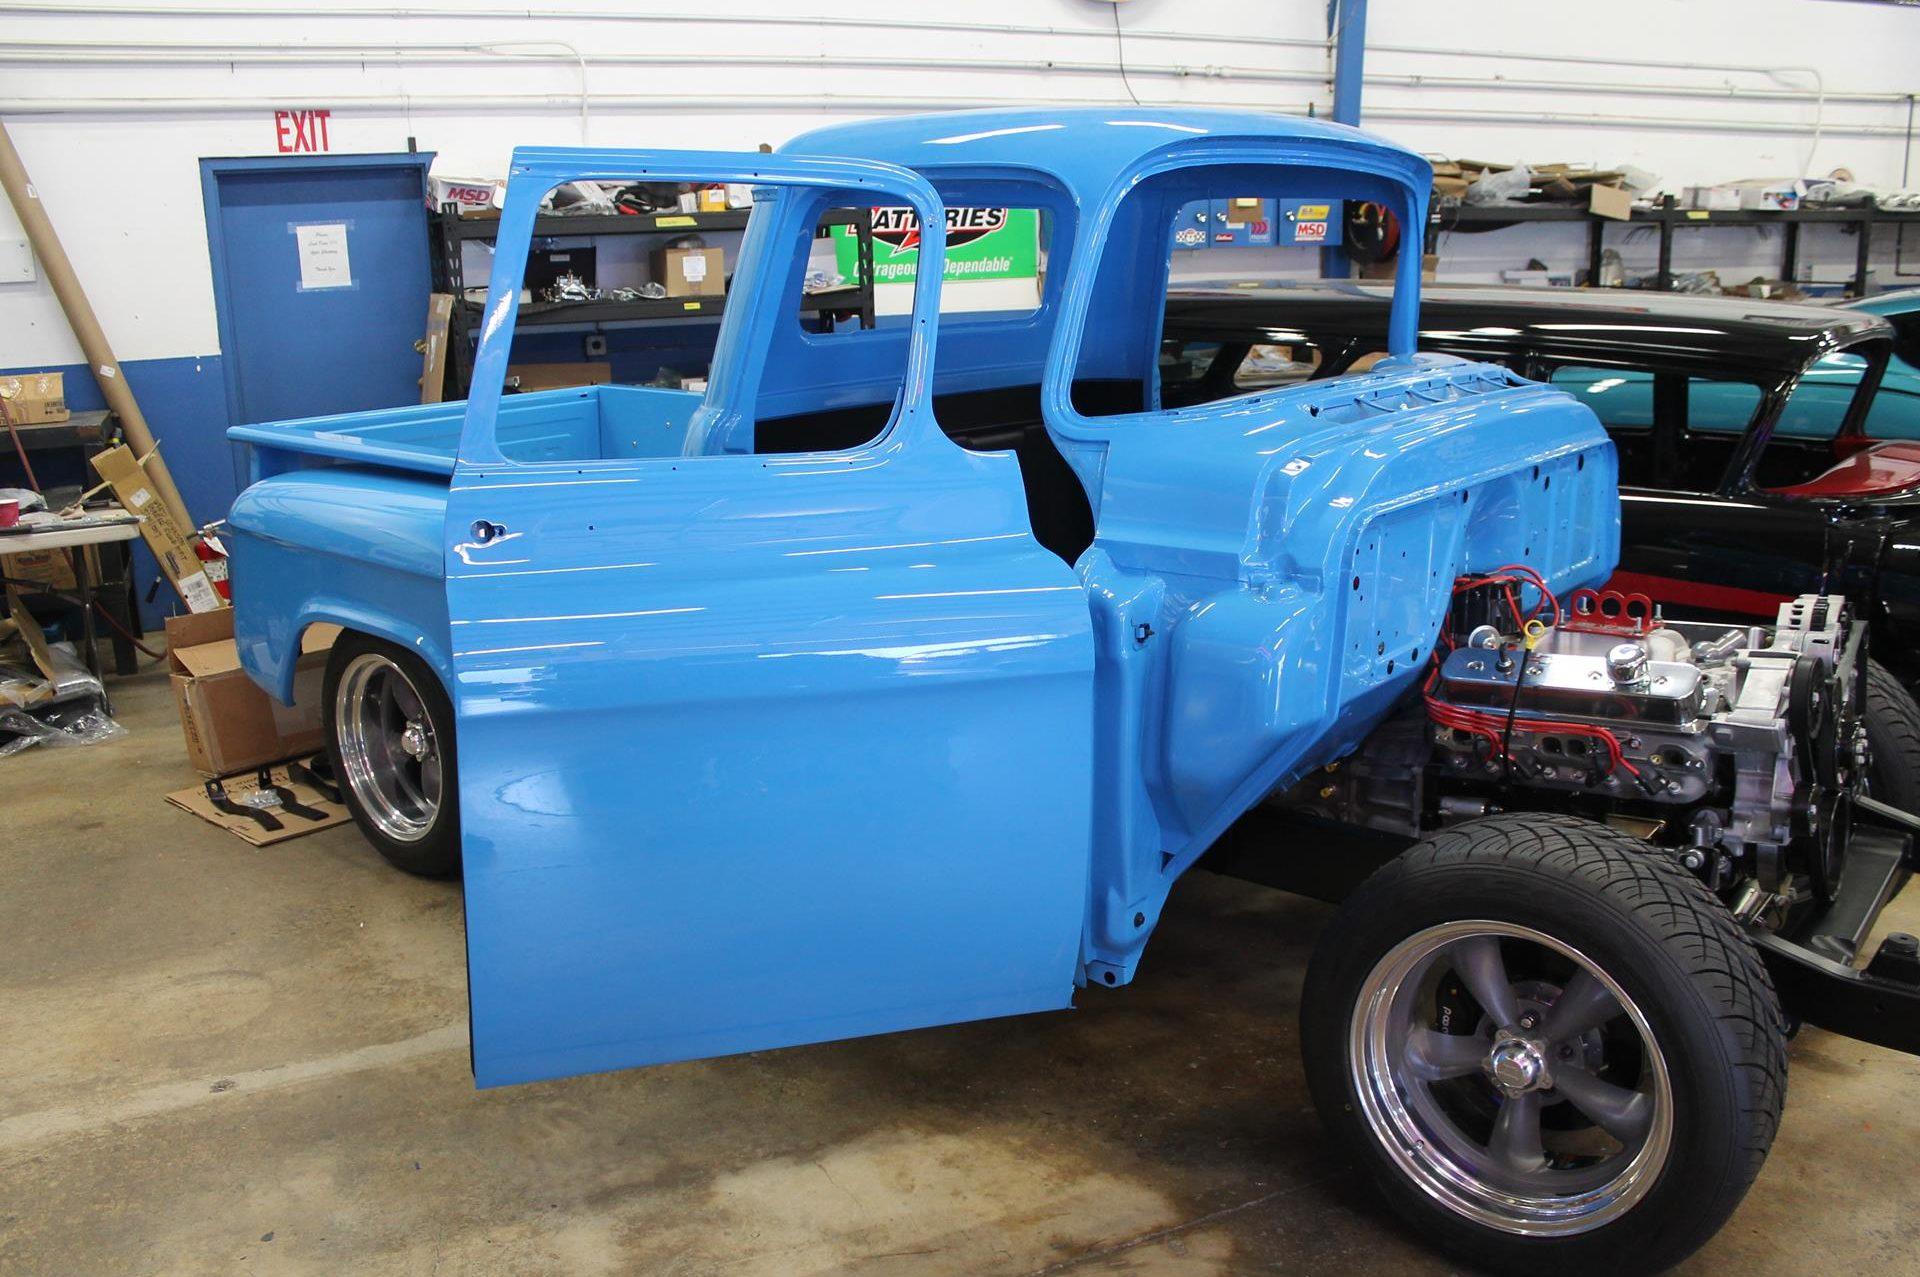 1955 Chevy Truck Metalworks Classics Auto Restoration